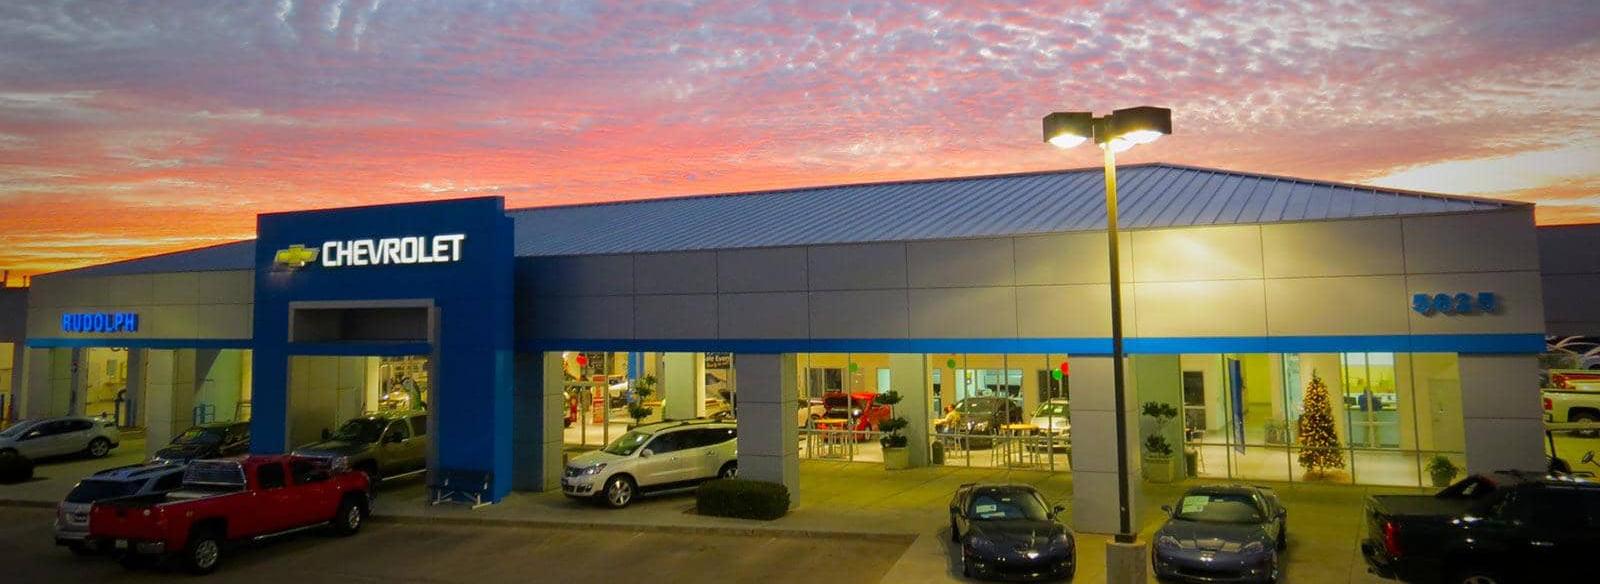 Chevrolet And Used Car Dealer In El Paso Rudolph Chevrolet